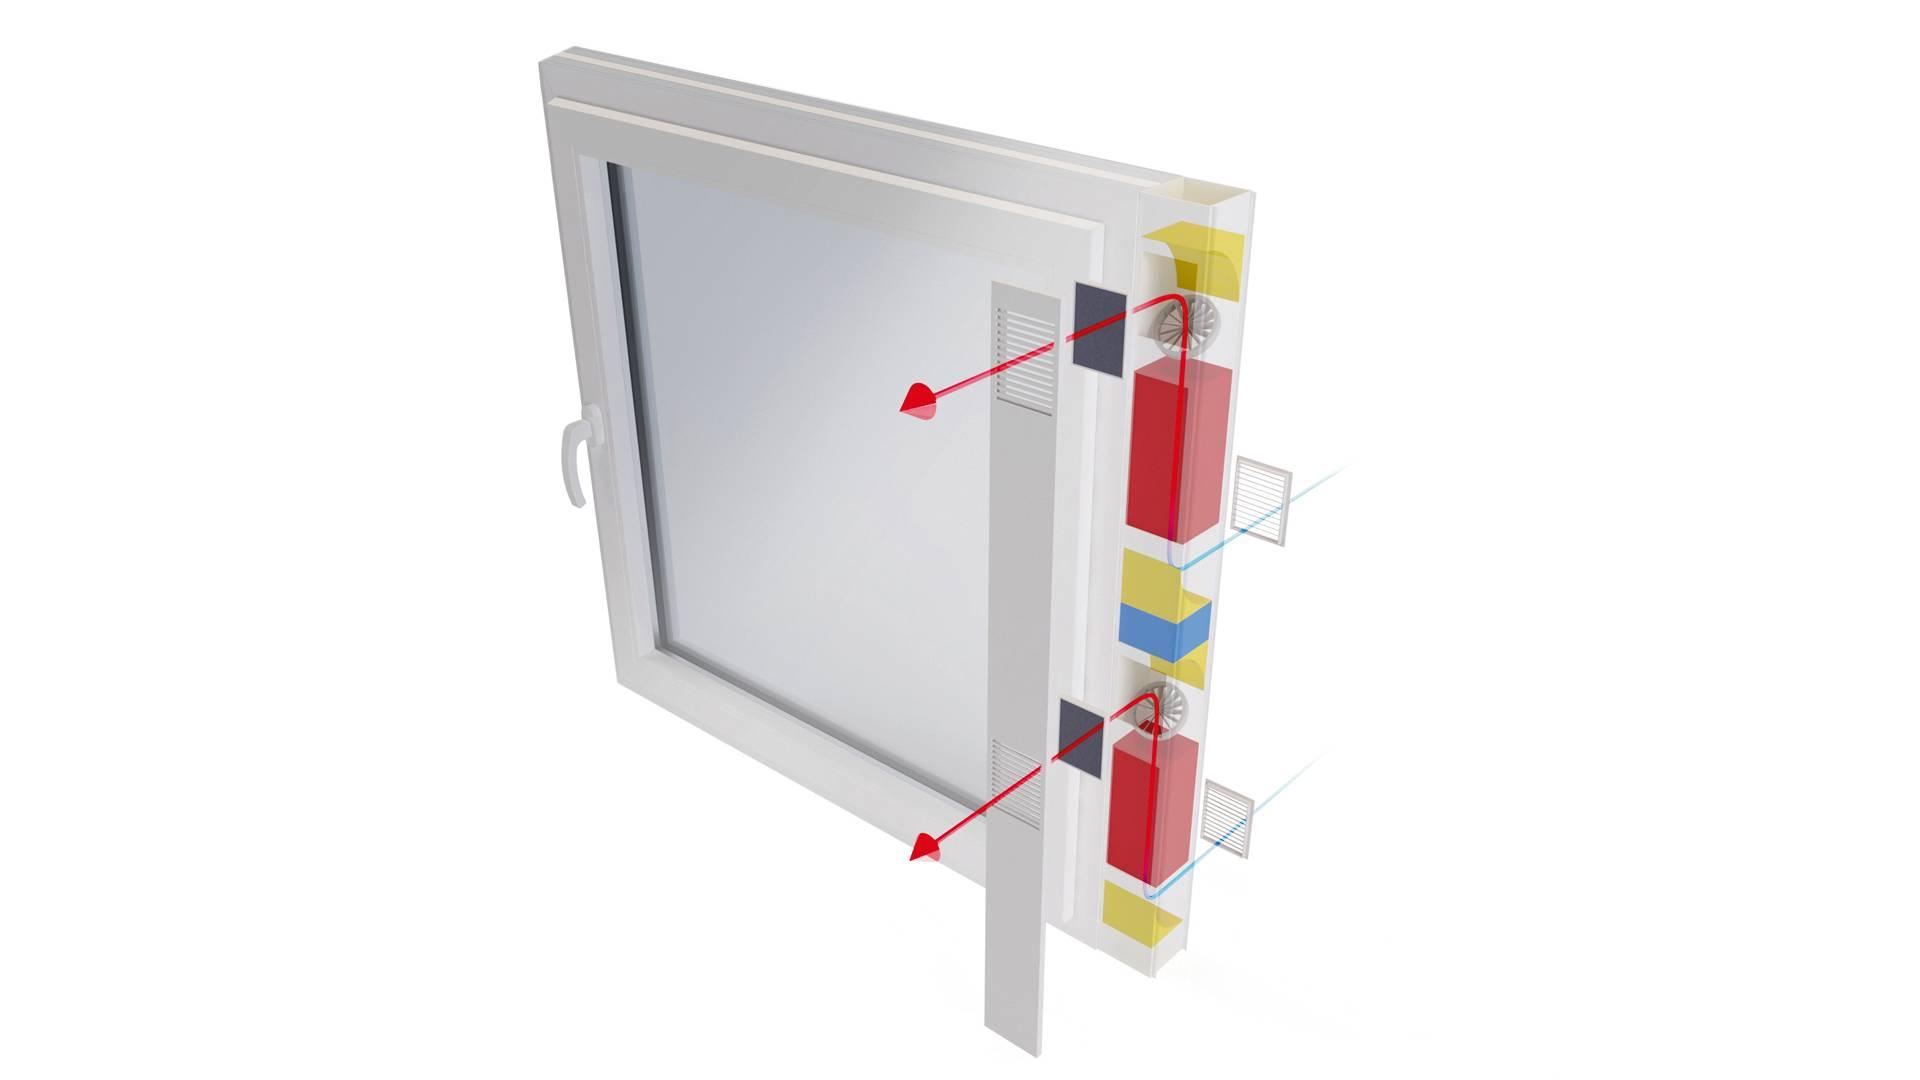 Grafik Fensterlüftung mit Wärmerückgewinnung